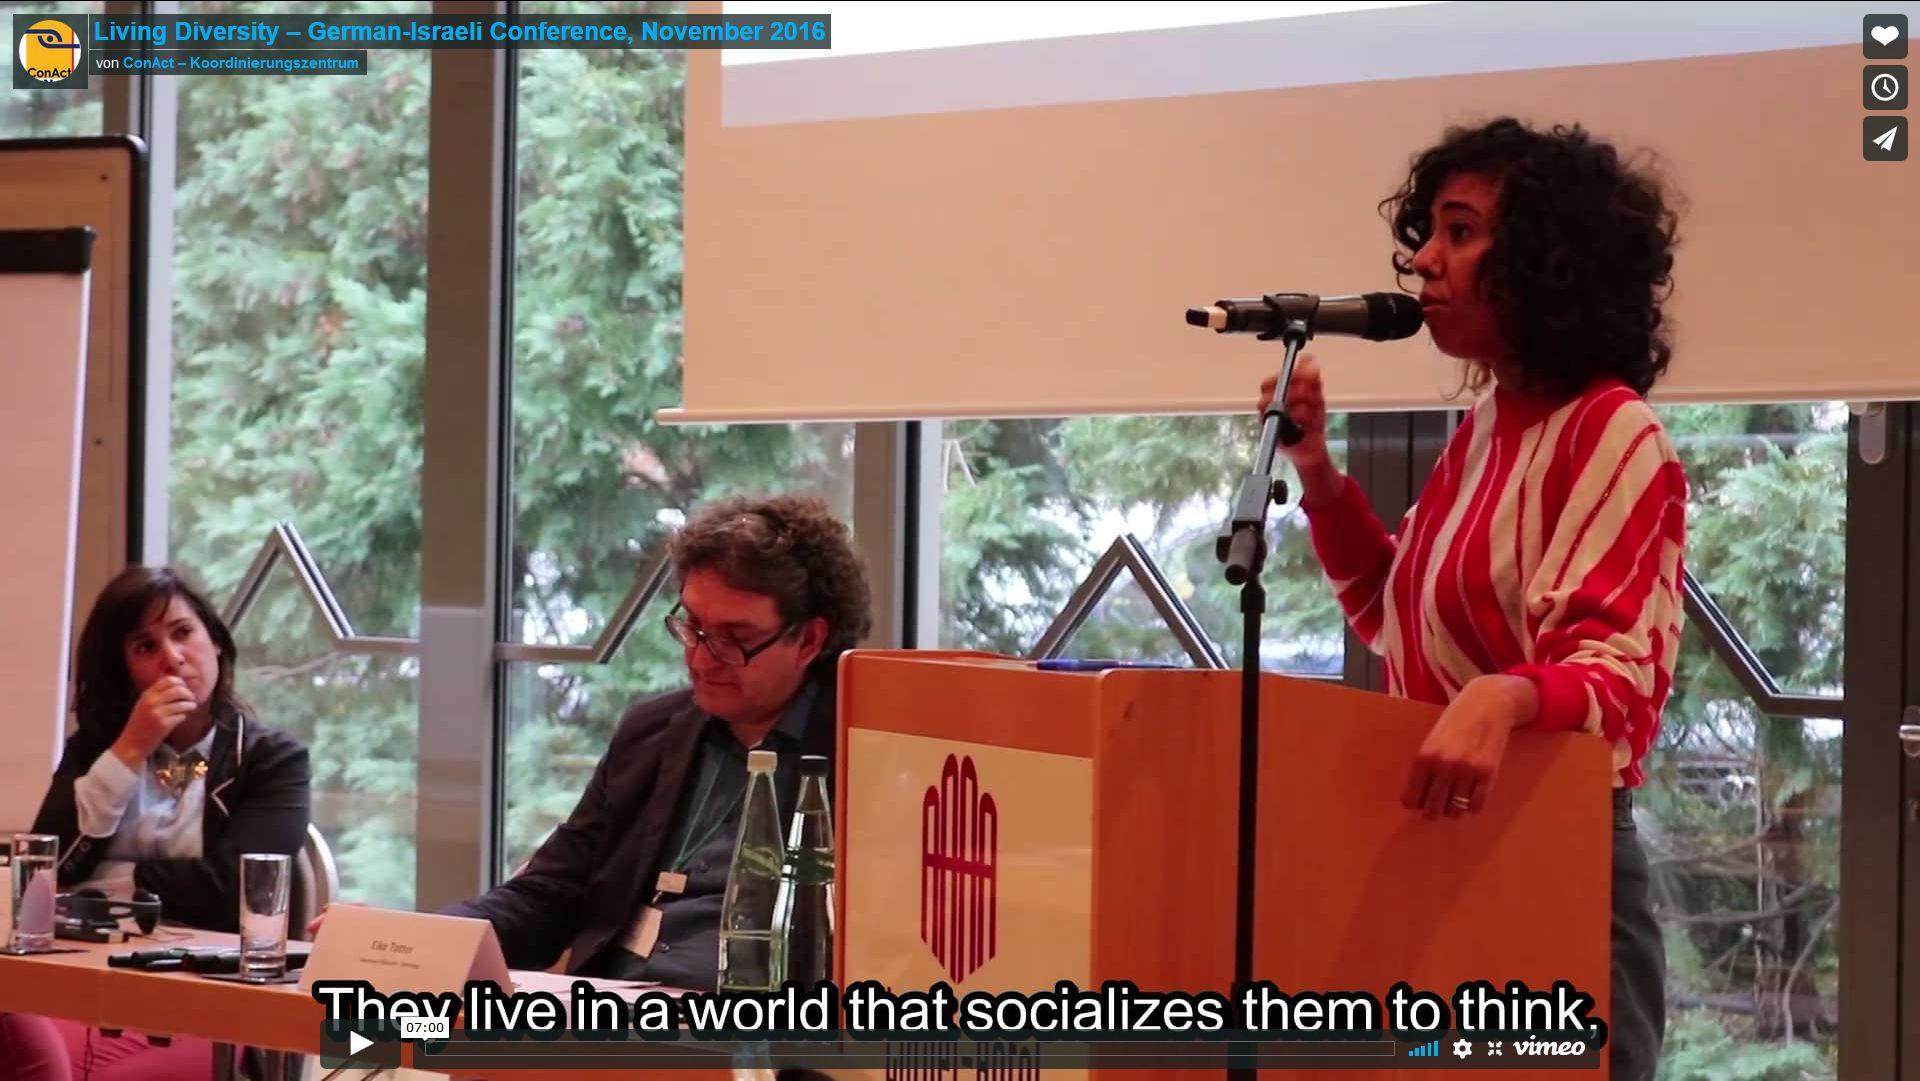 Living Diversity – German-Israeli Conference, November 2016